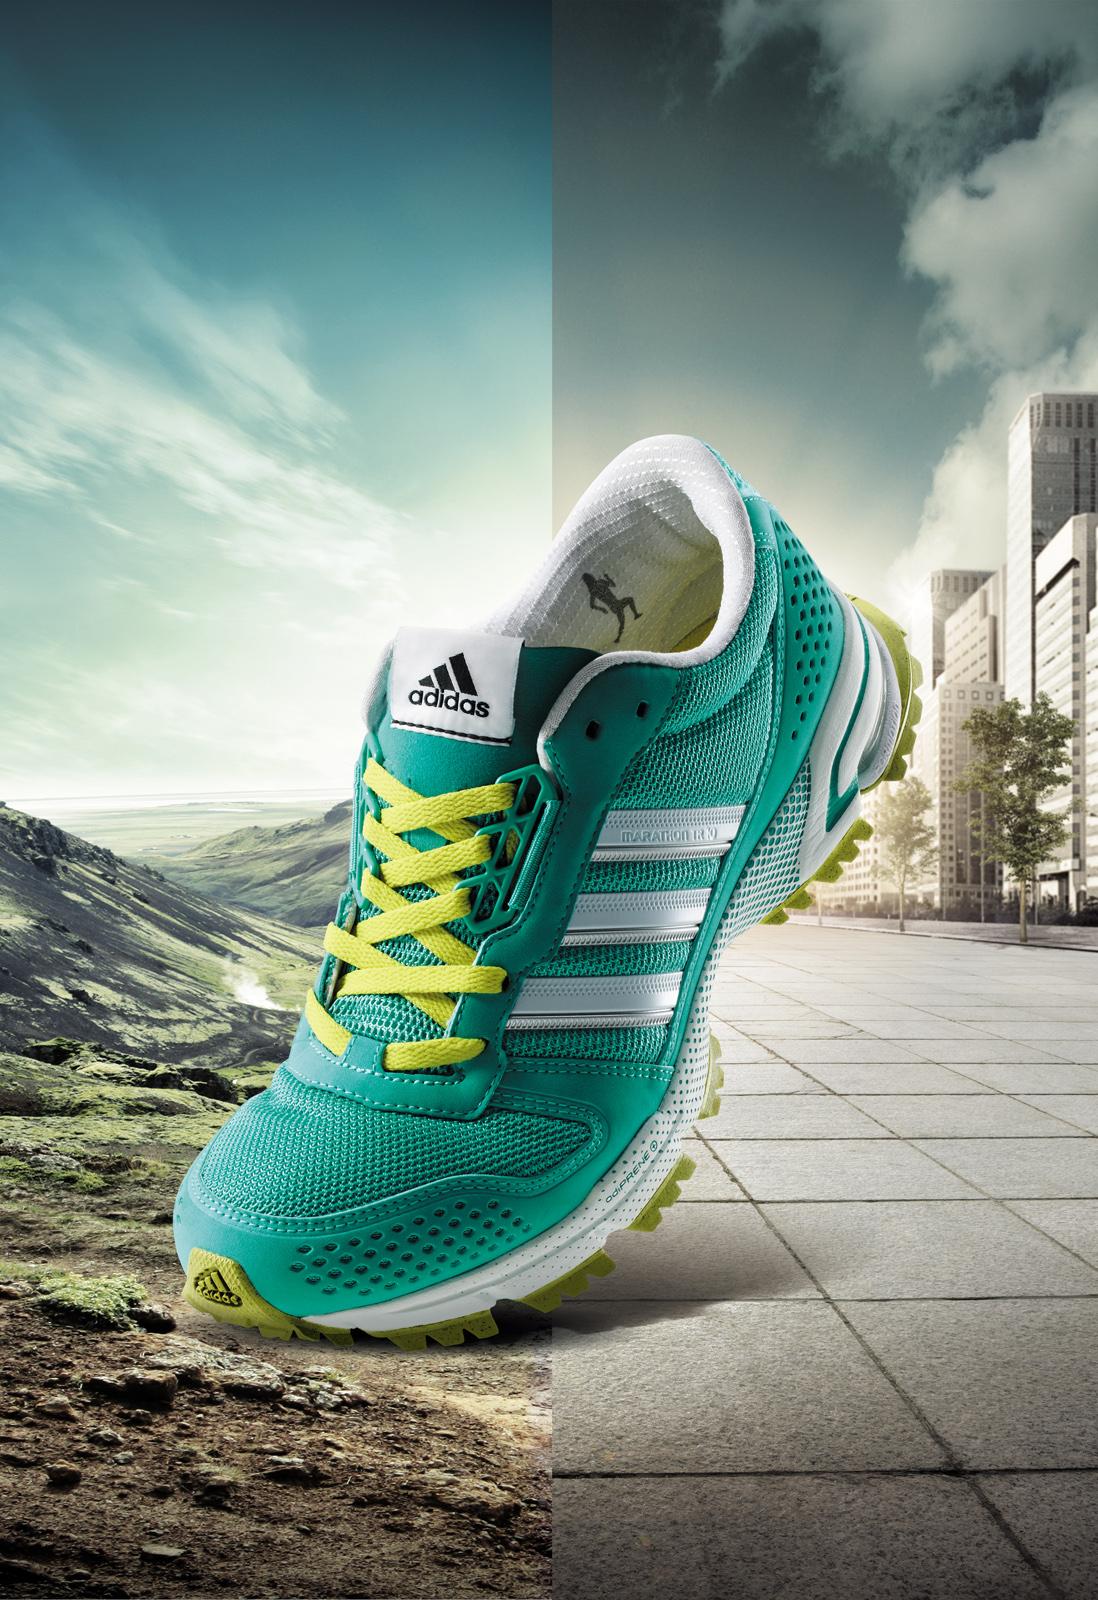 adidas_M10